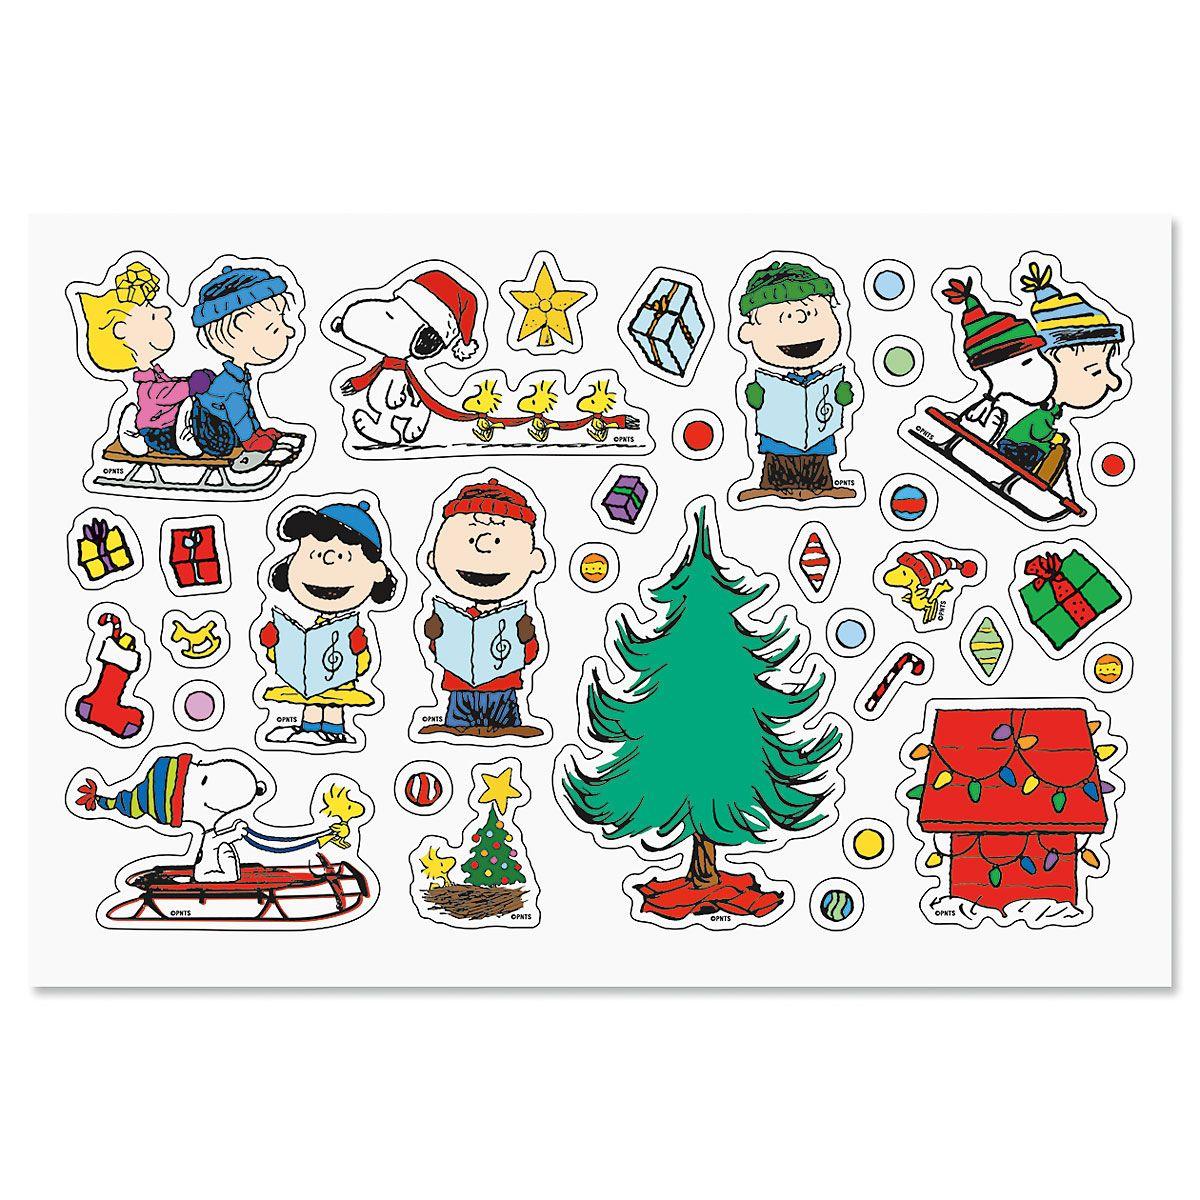 PEANUTS® Stickers – Buy 1 Get 1 Free